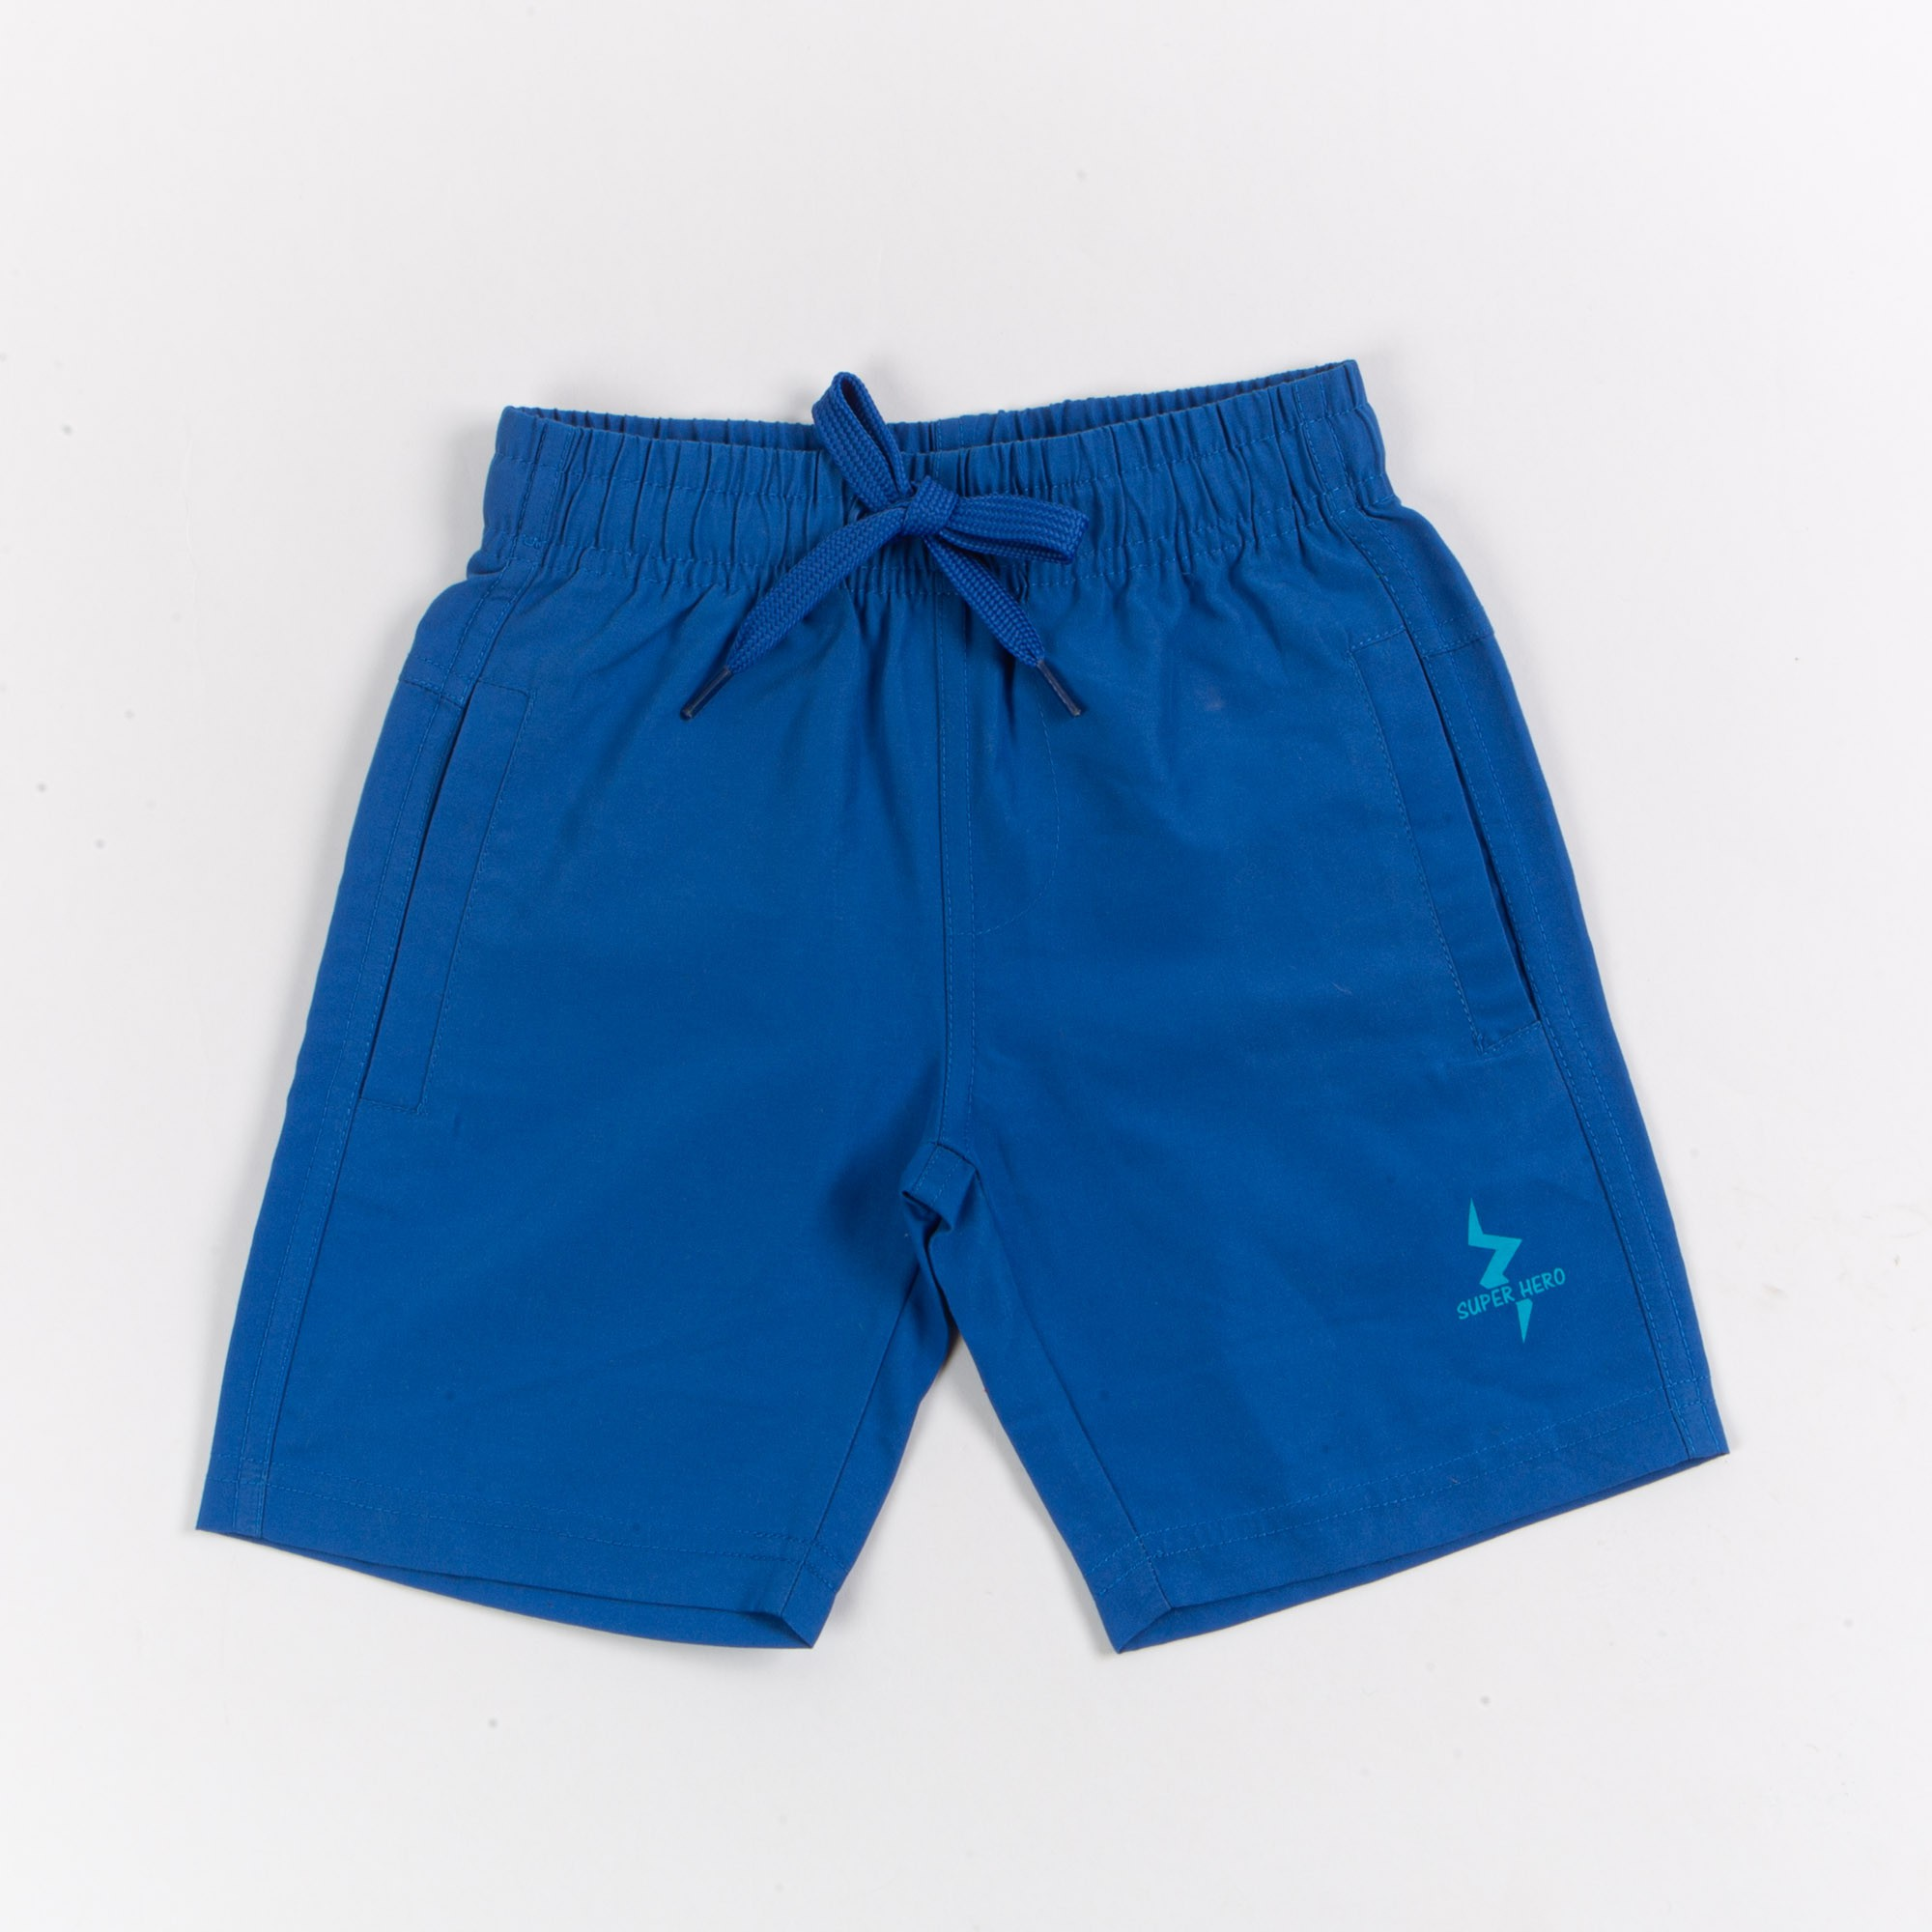 Bermuda Infantil Microfibra Praia Azul - Tip Top